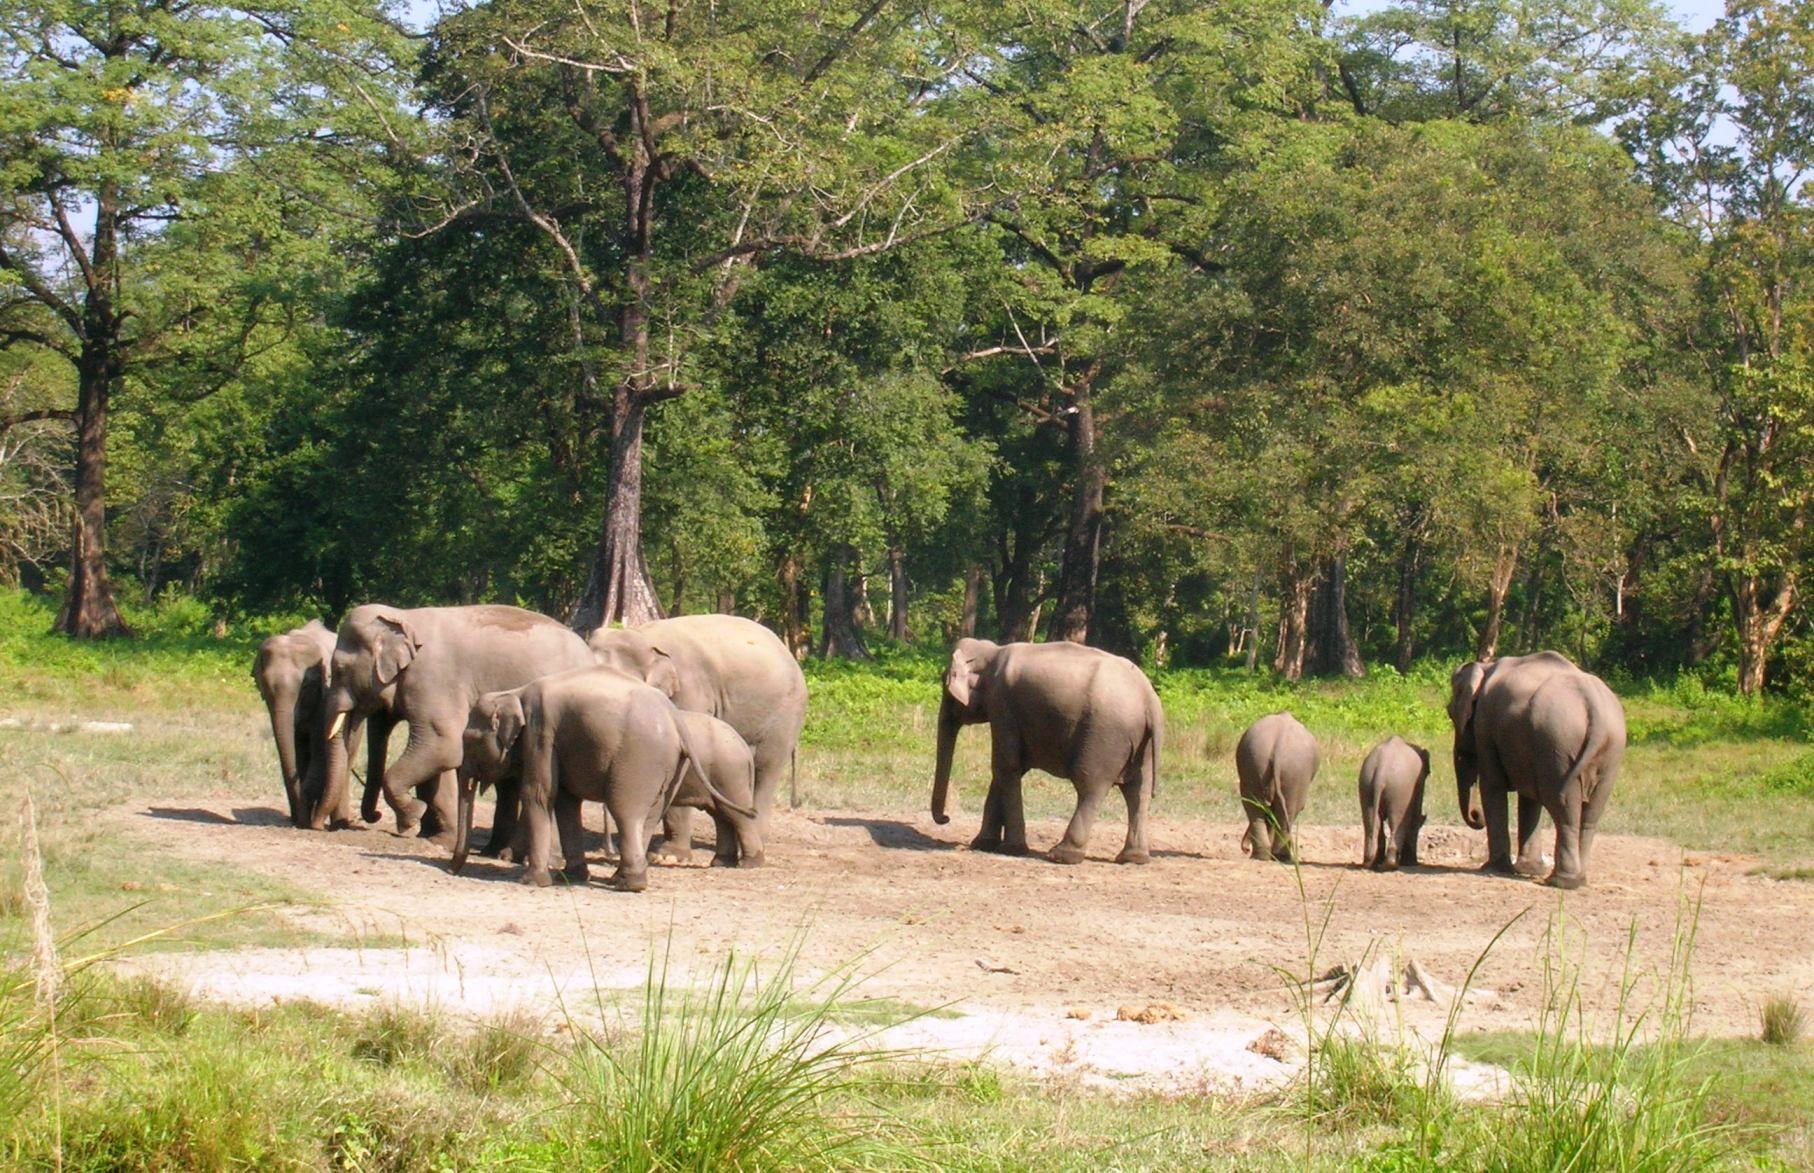 Doars A Treasure In North Bengal Chapramari Forest Beautifulbengal Mustvisit Herd Of Elephants Wildlife Sanctuary Wildlife